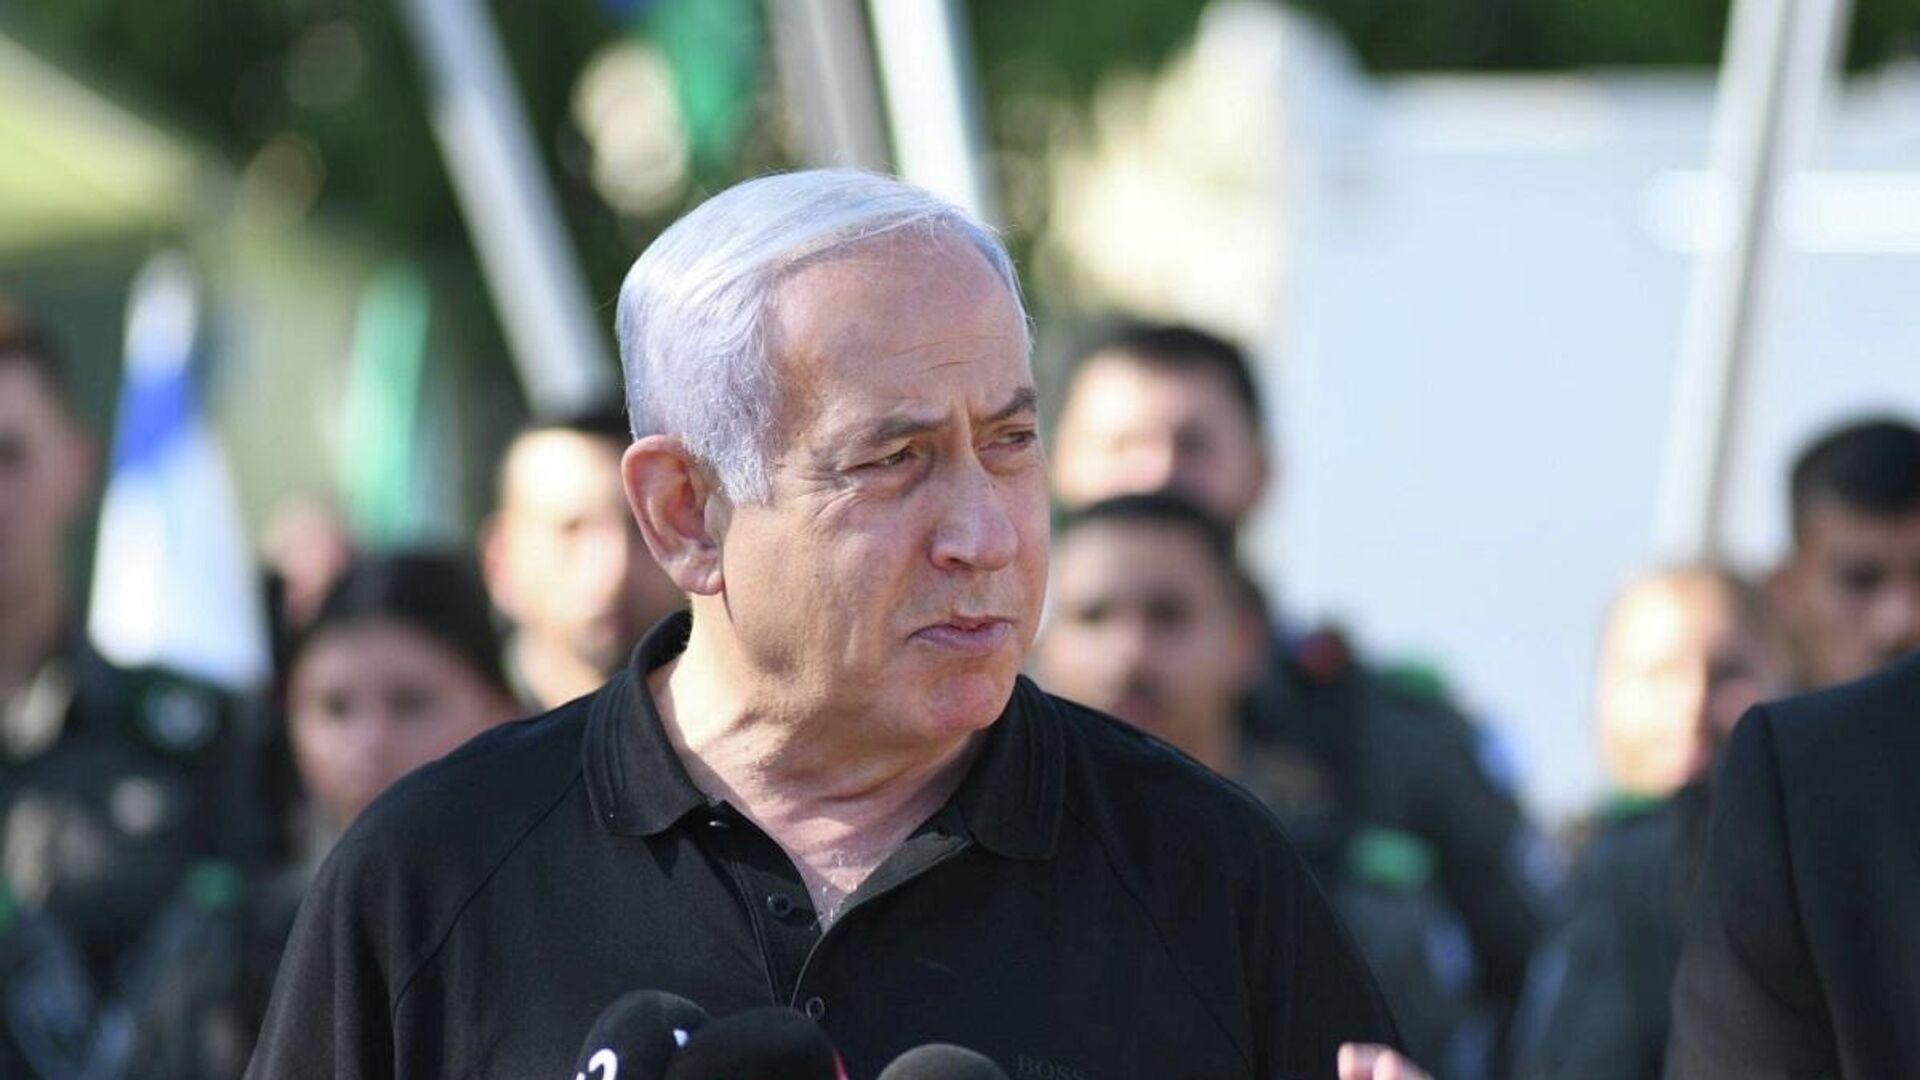 Benjamín Netanyahu, el primer ministro israelí - Sputnik Mundo, 1920, 13.05.2021